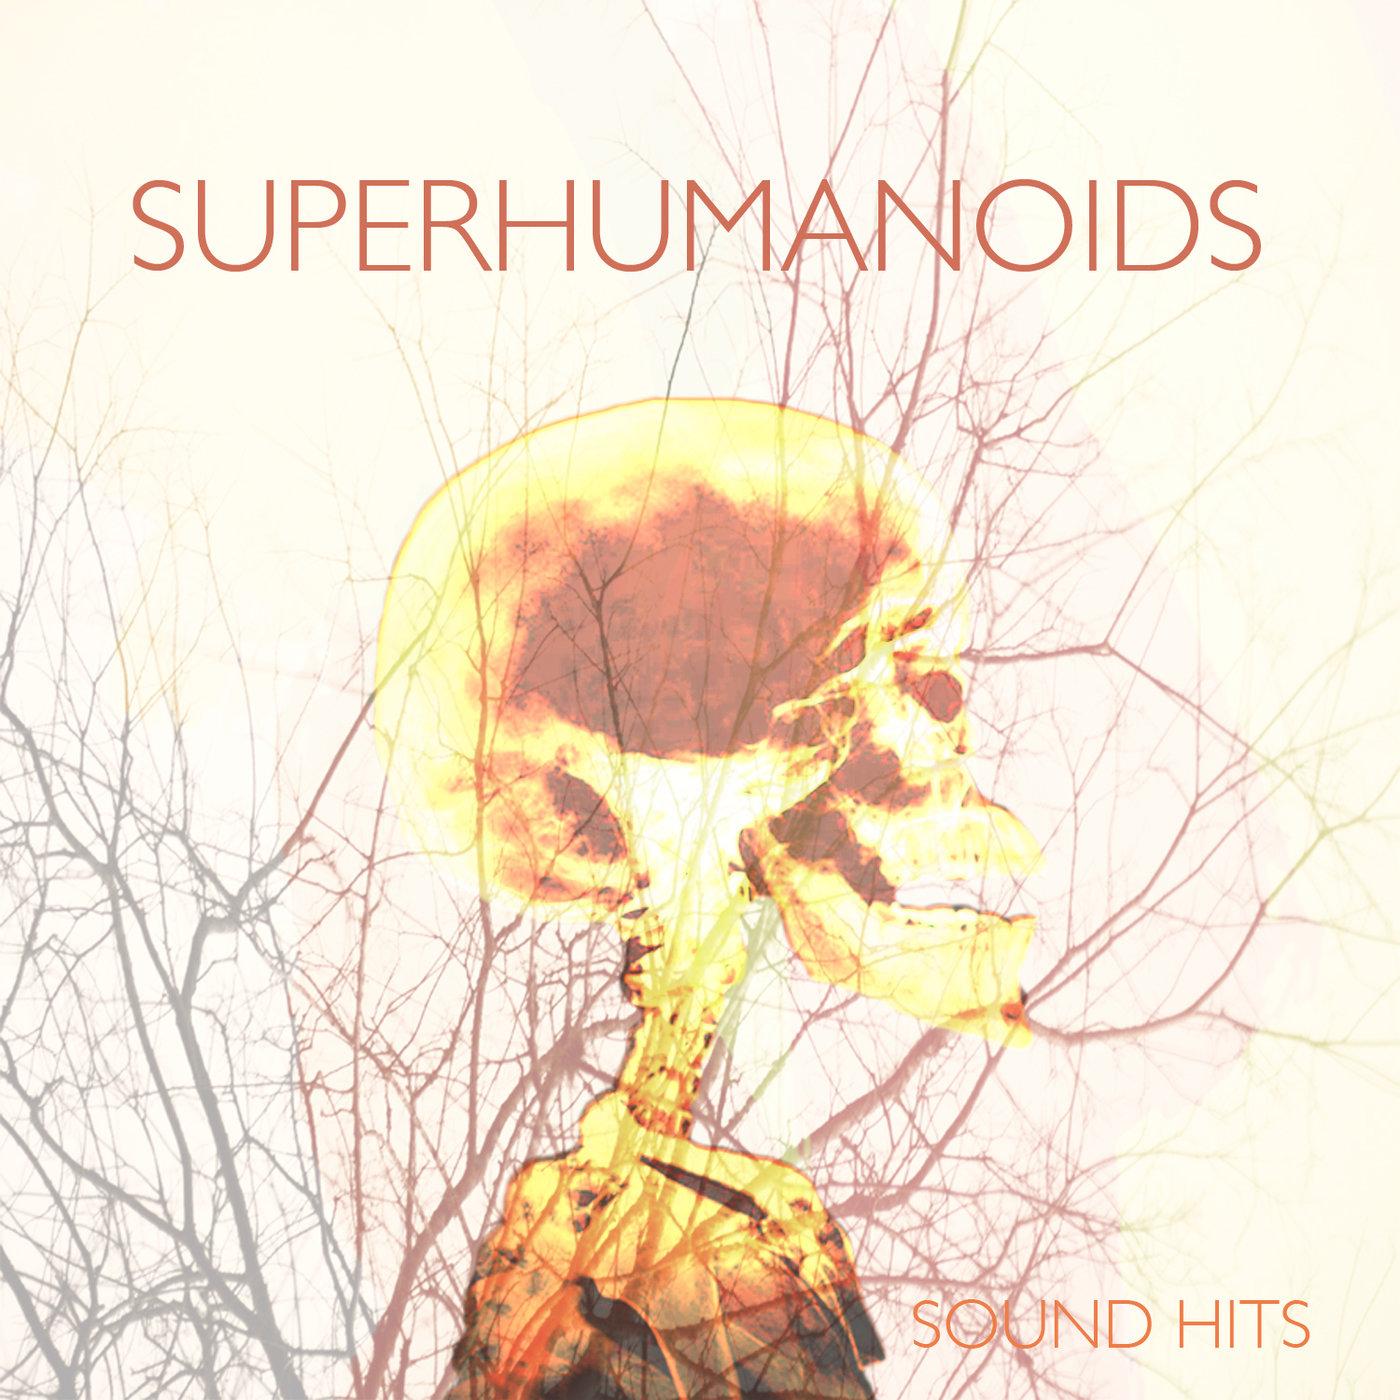 Superhumanoids Album by Kimberly Tobar at Coroflot com